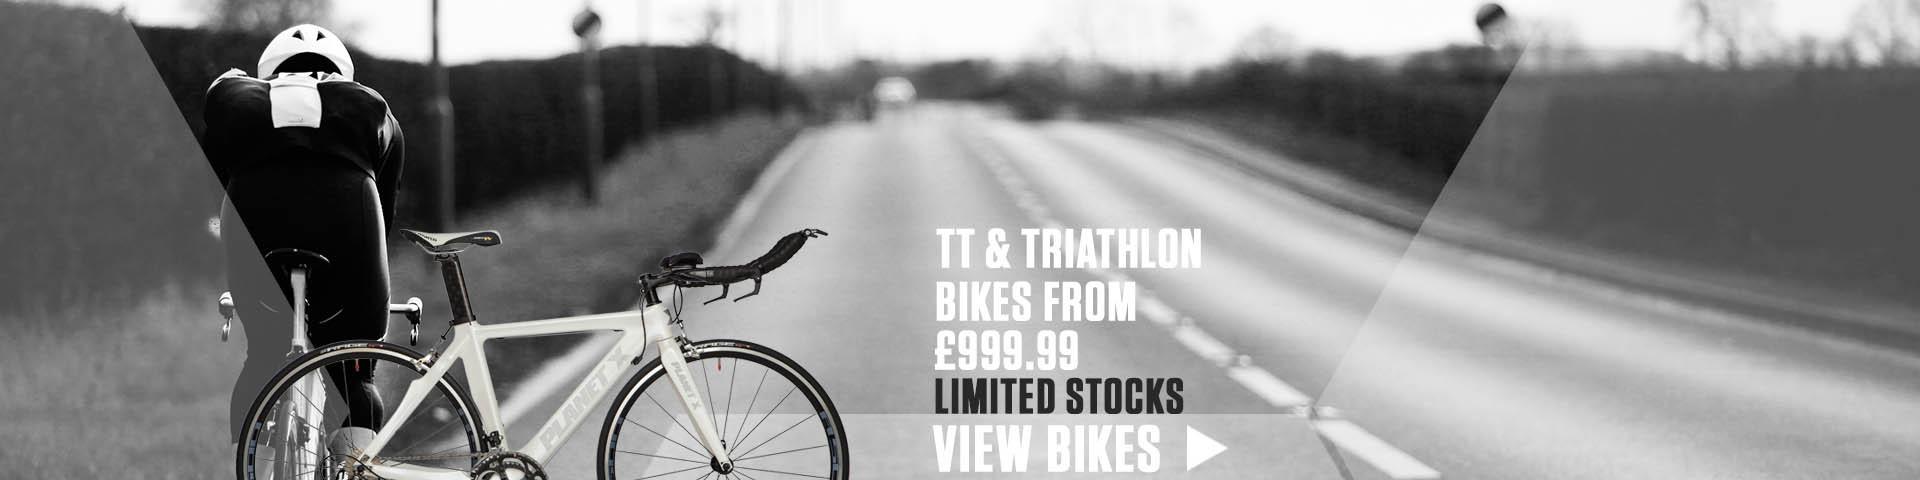 TT Bikes from 999.99